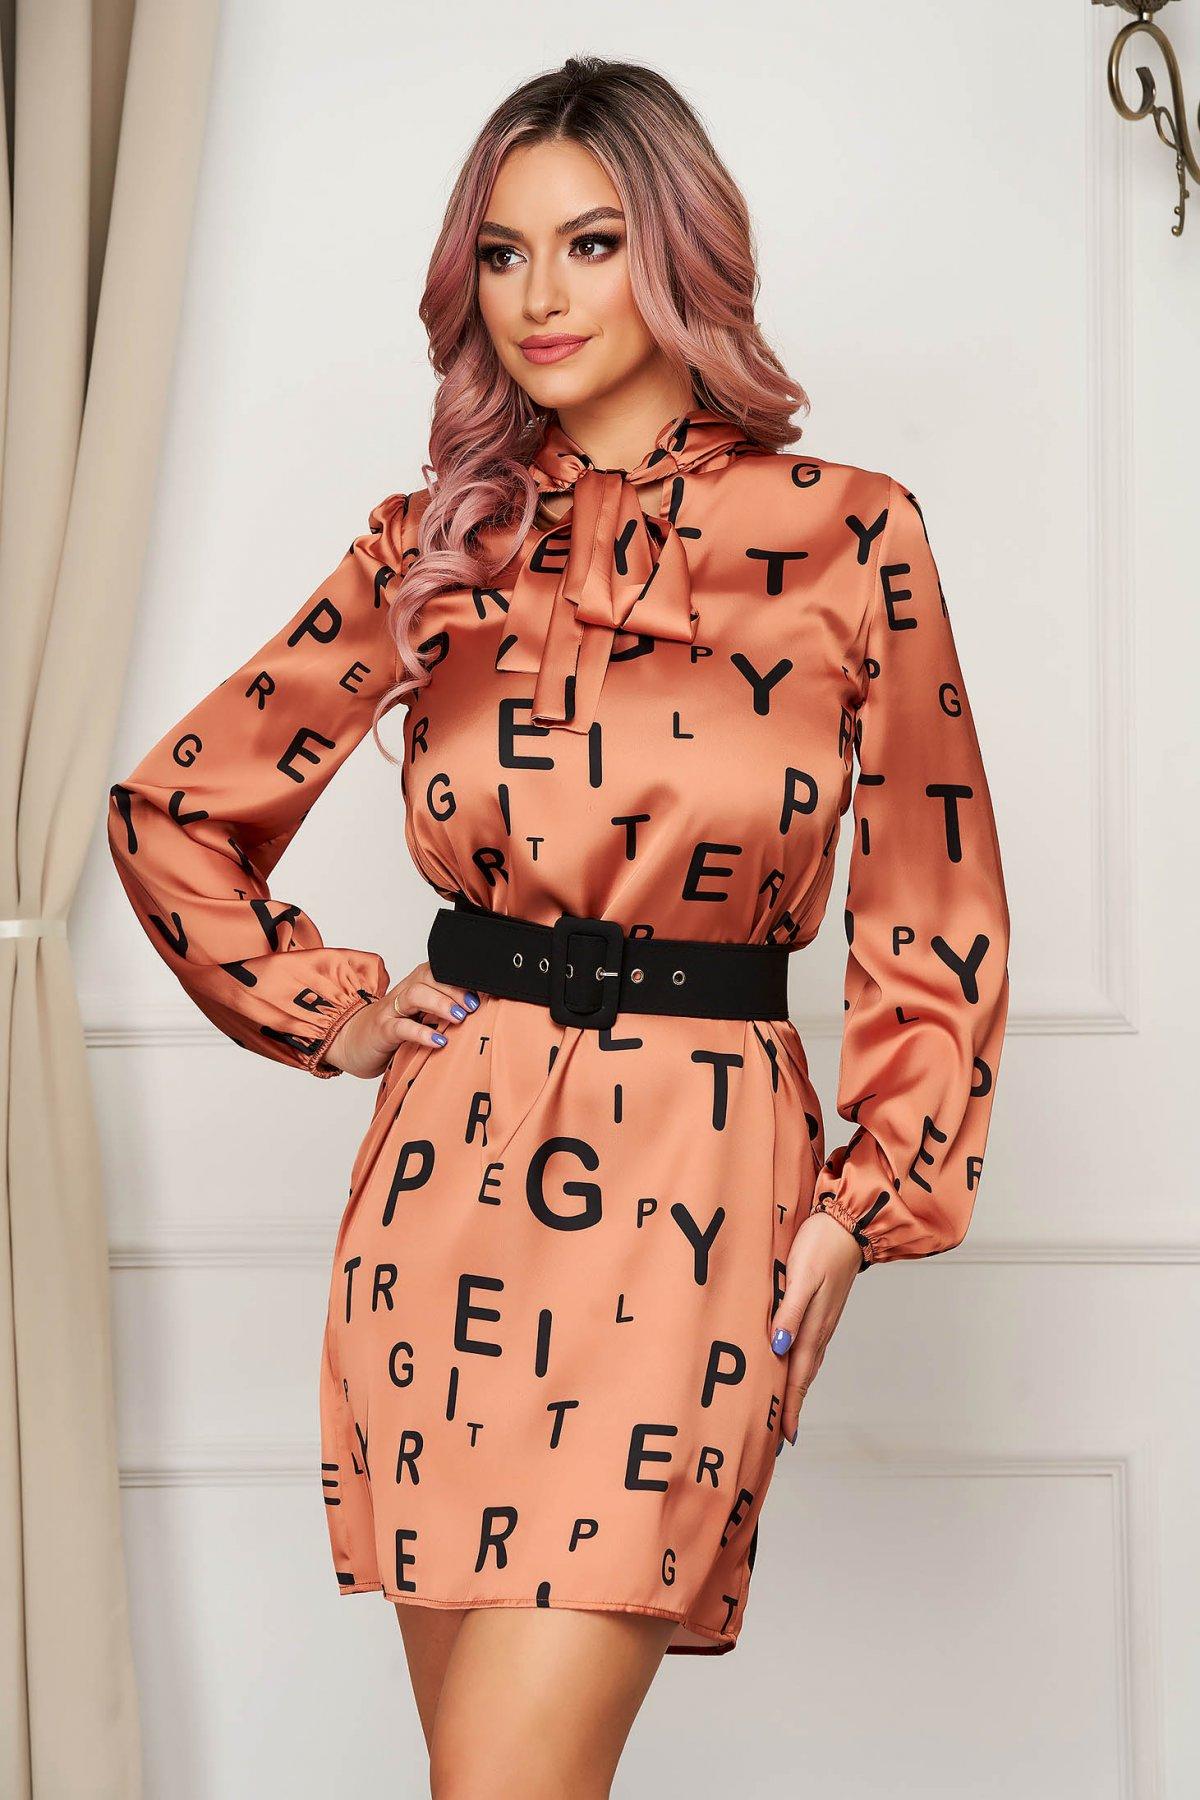 Rochie PrettyGirl portocalie de zi scurta cu un croi drept din material subtire cu imprimeuri grafice cu accesoriu tip curea PrettyGirl